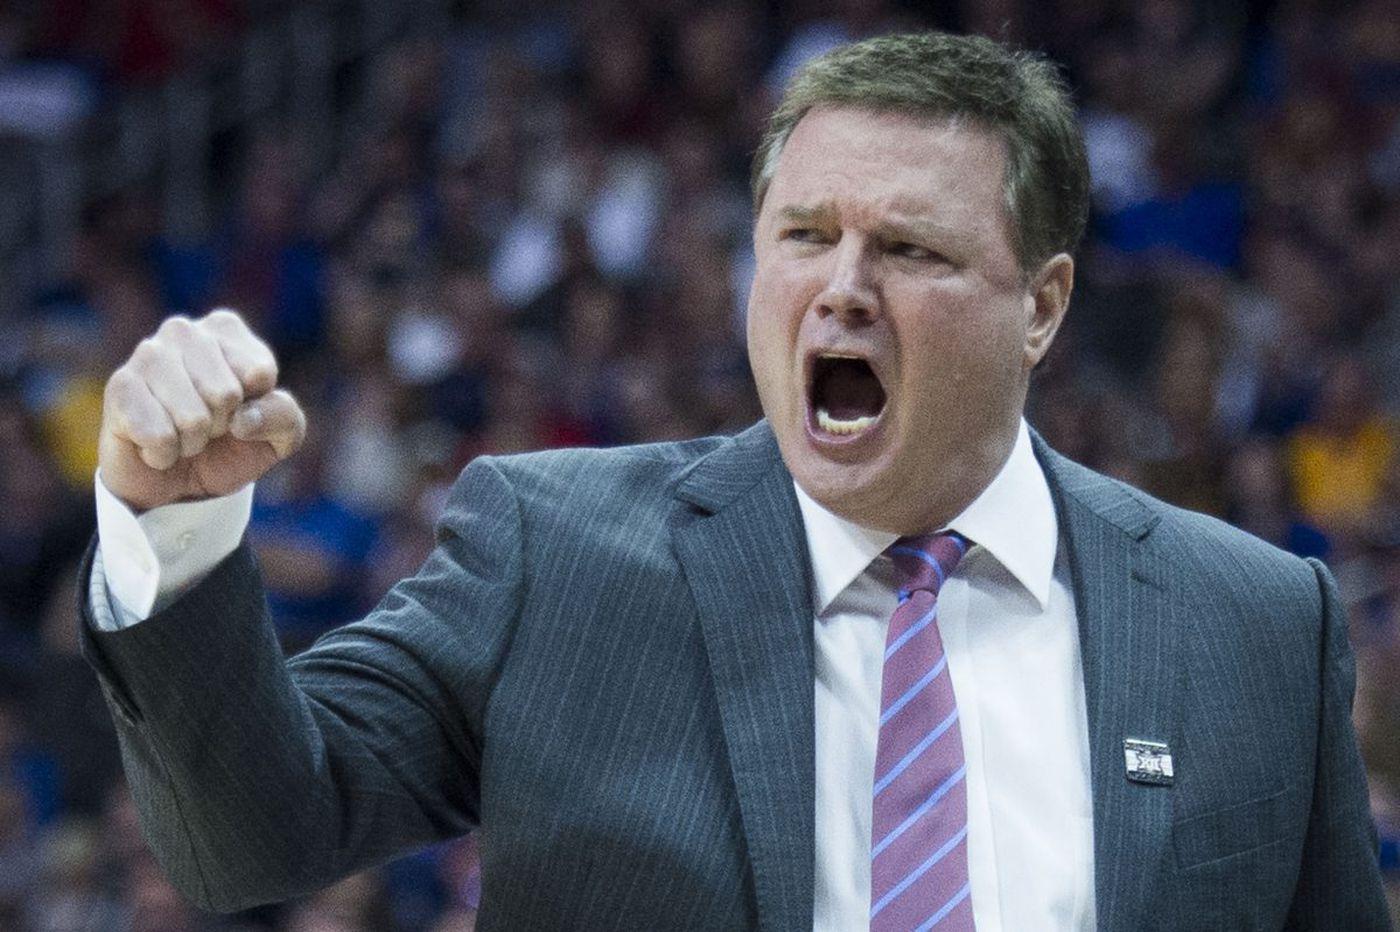 Kansas coach on Penn: 'They can beat us.'